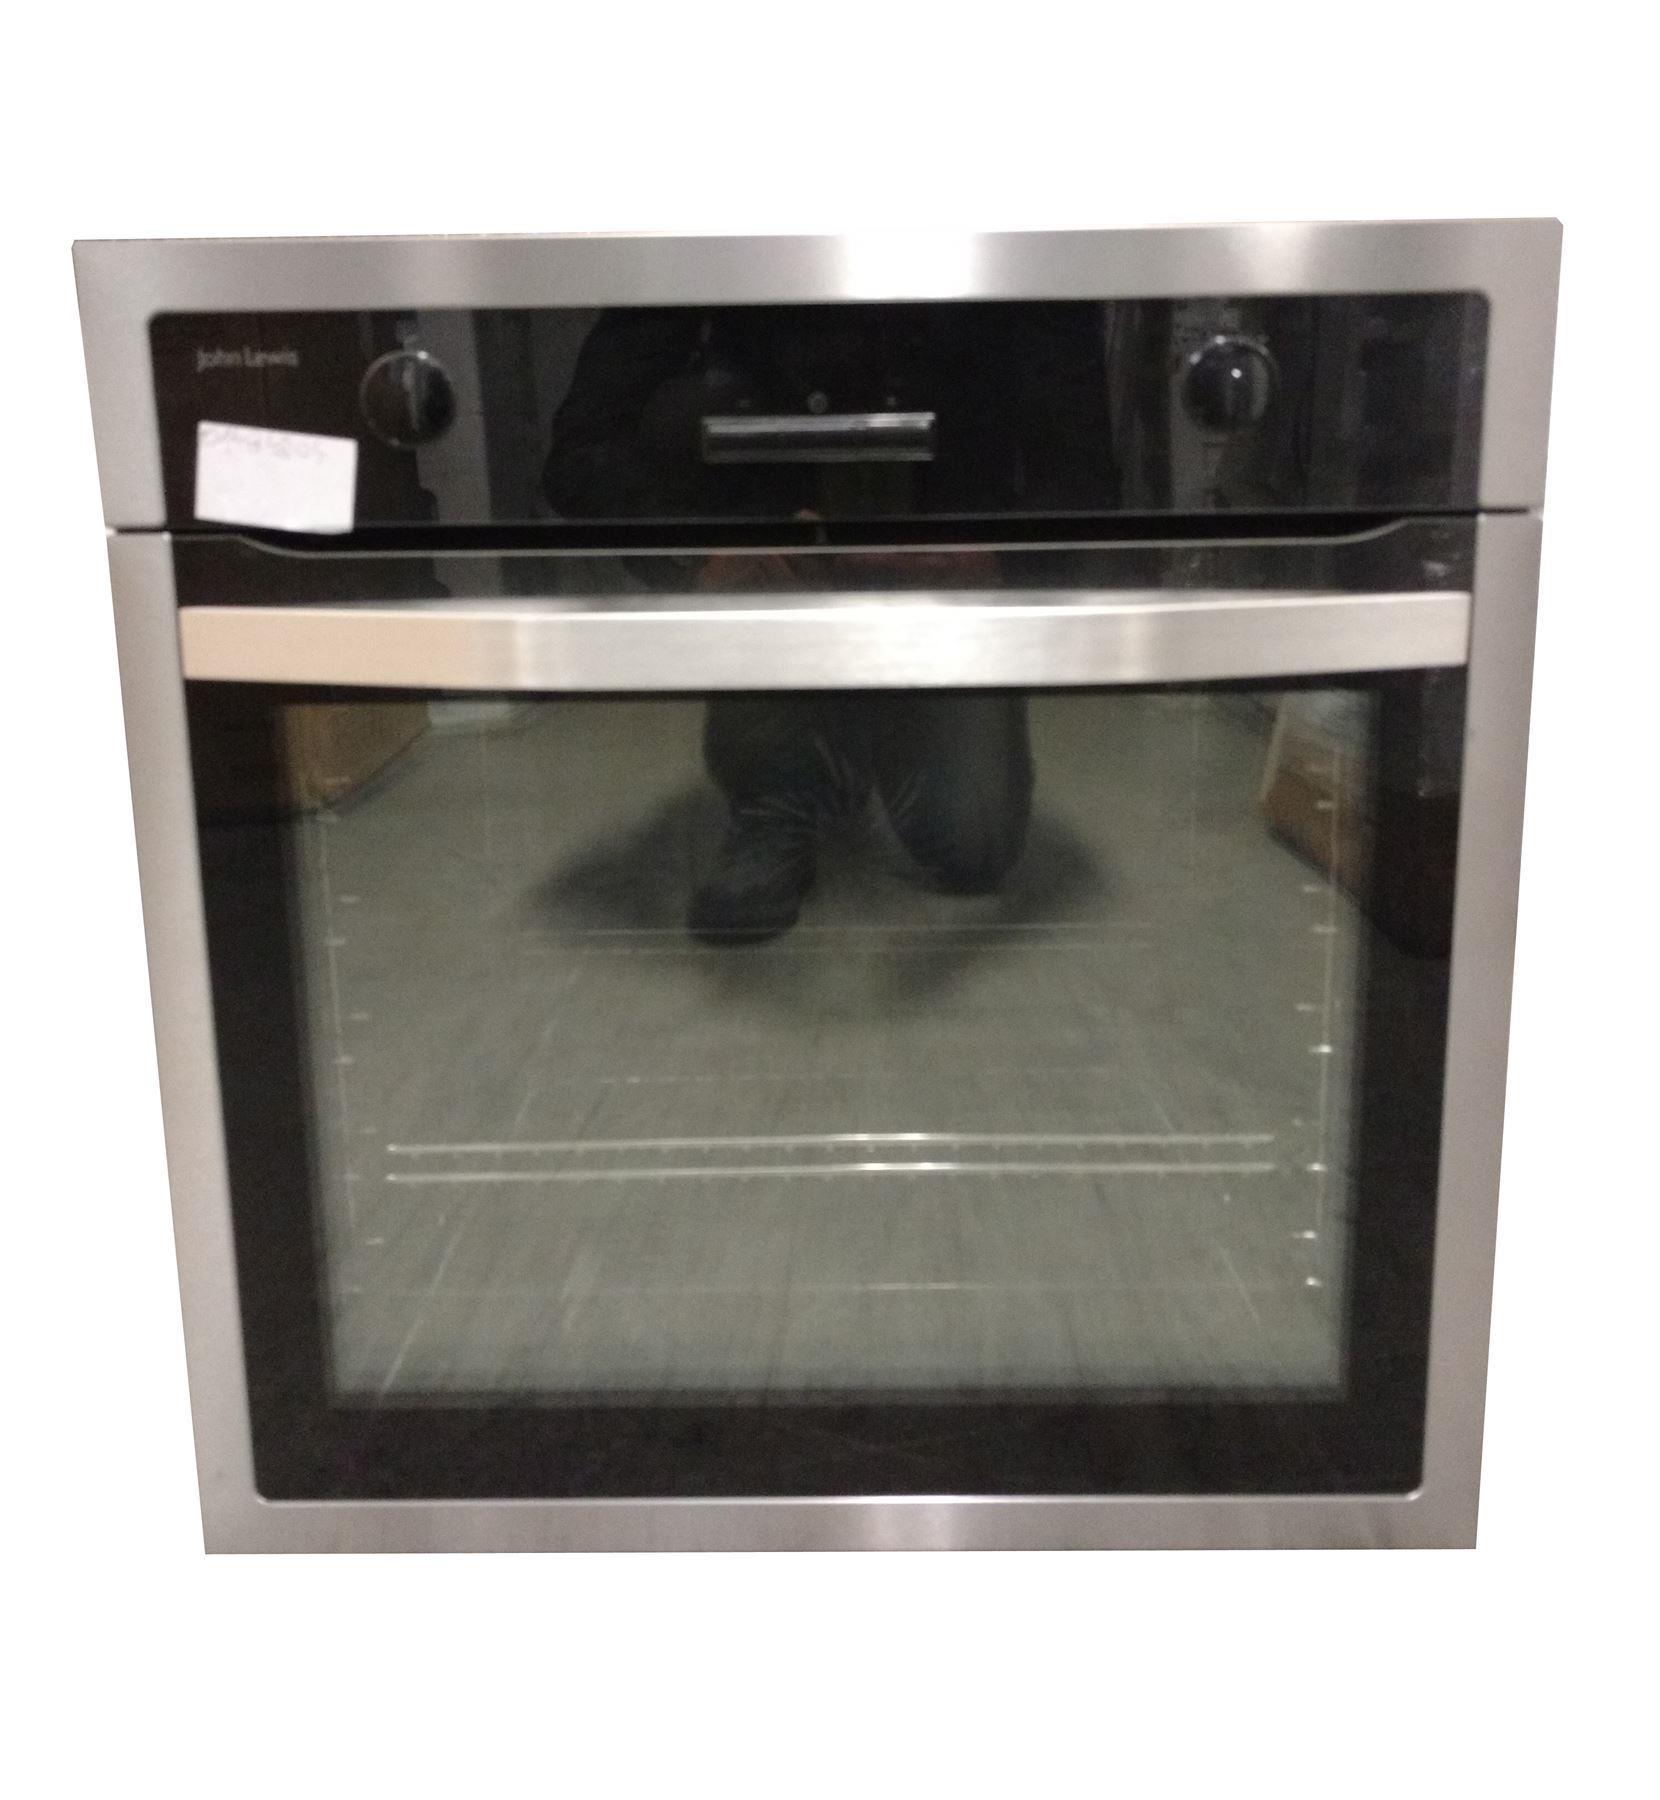 john lewis jlbios616 single oven stainless steel online. Black Bedroom Furniture Sets. Home Design Ideas